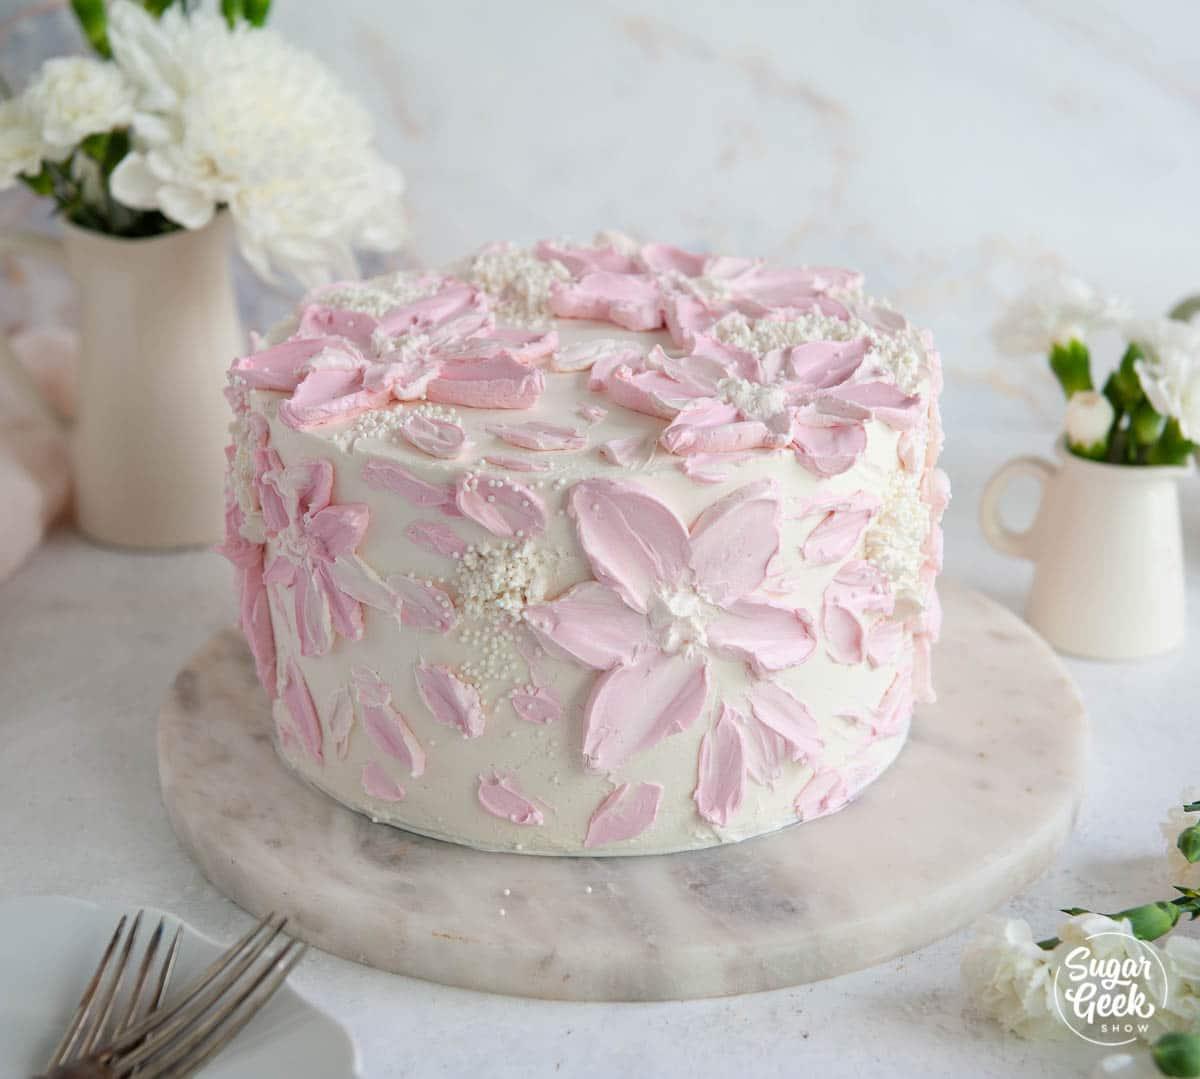 buttercream cake on a white background